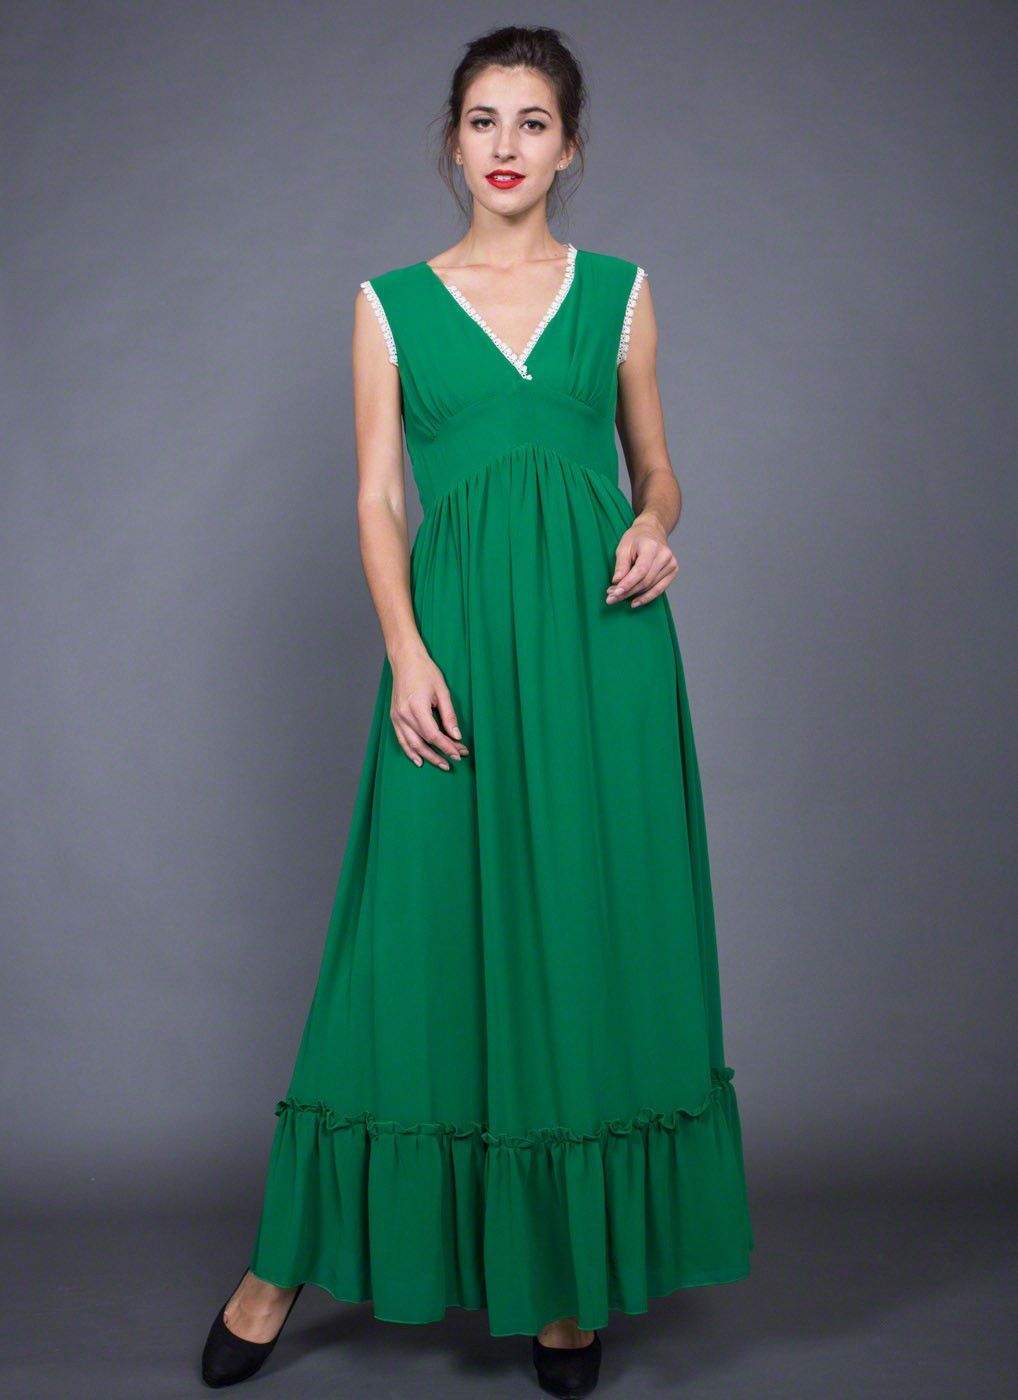 445374db63 ... Emerald Green Prom Dress -Maxi Dress Elegant emerald green color V neck  Angled empire waist with wide waist yoke Refreshing white lace trim details  ...